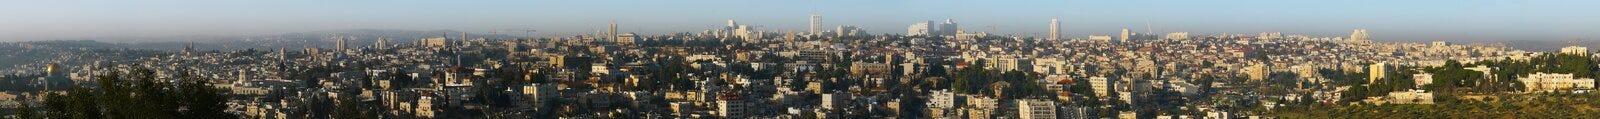 Panorama Jeruzalem Israël Royalty-vrije Stock Afbeeldingen